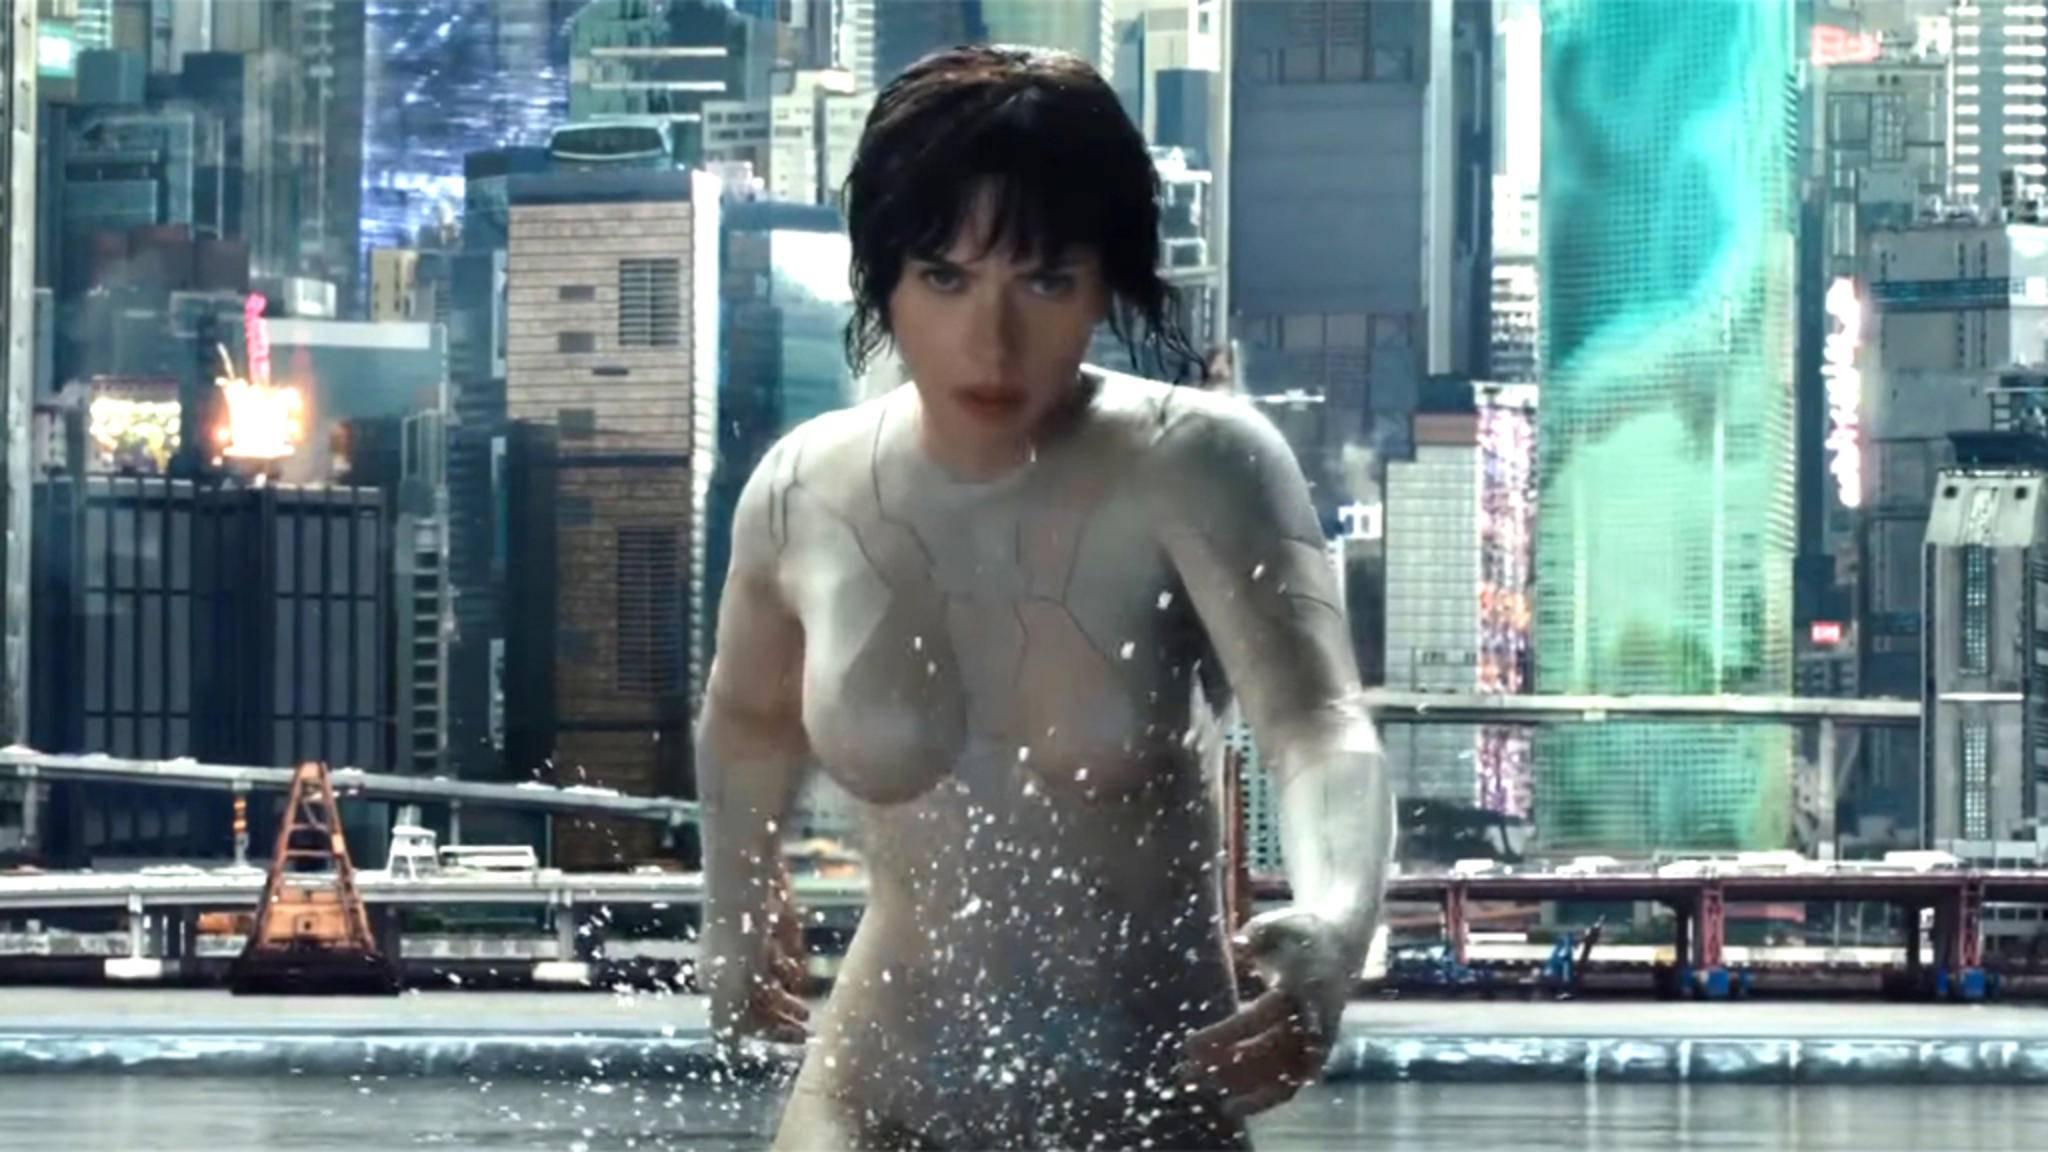 Mithilfe ihres Thermoptic Suits kann sich Major Motoko Kusanagi (Scarlett Johansson) unsichtbar machen.